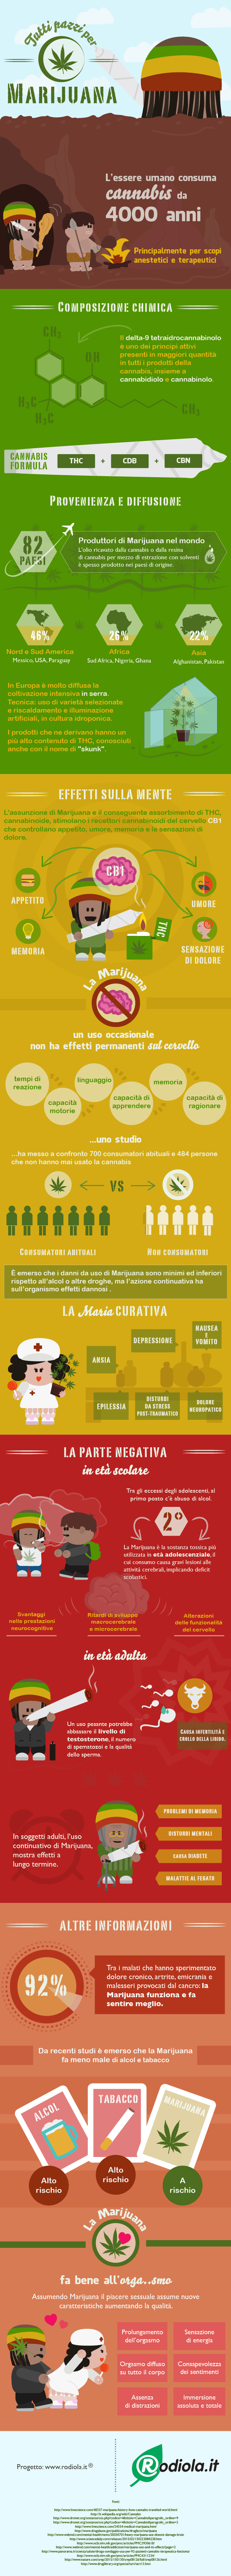 Benefici della marijuana - infografica